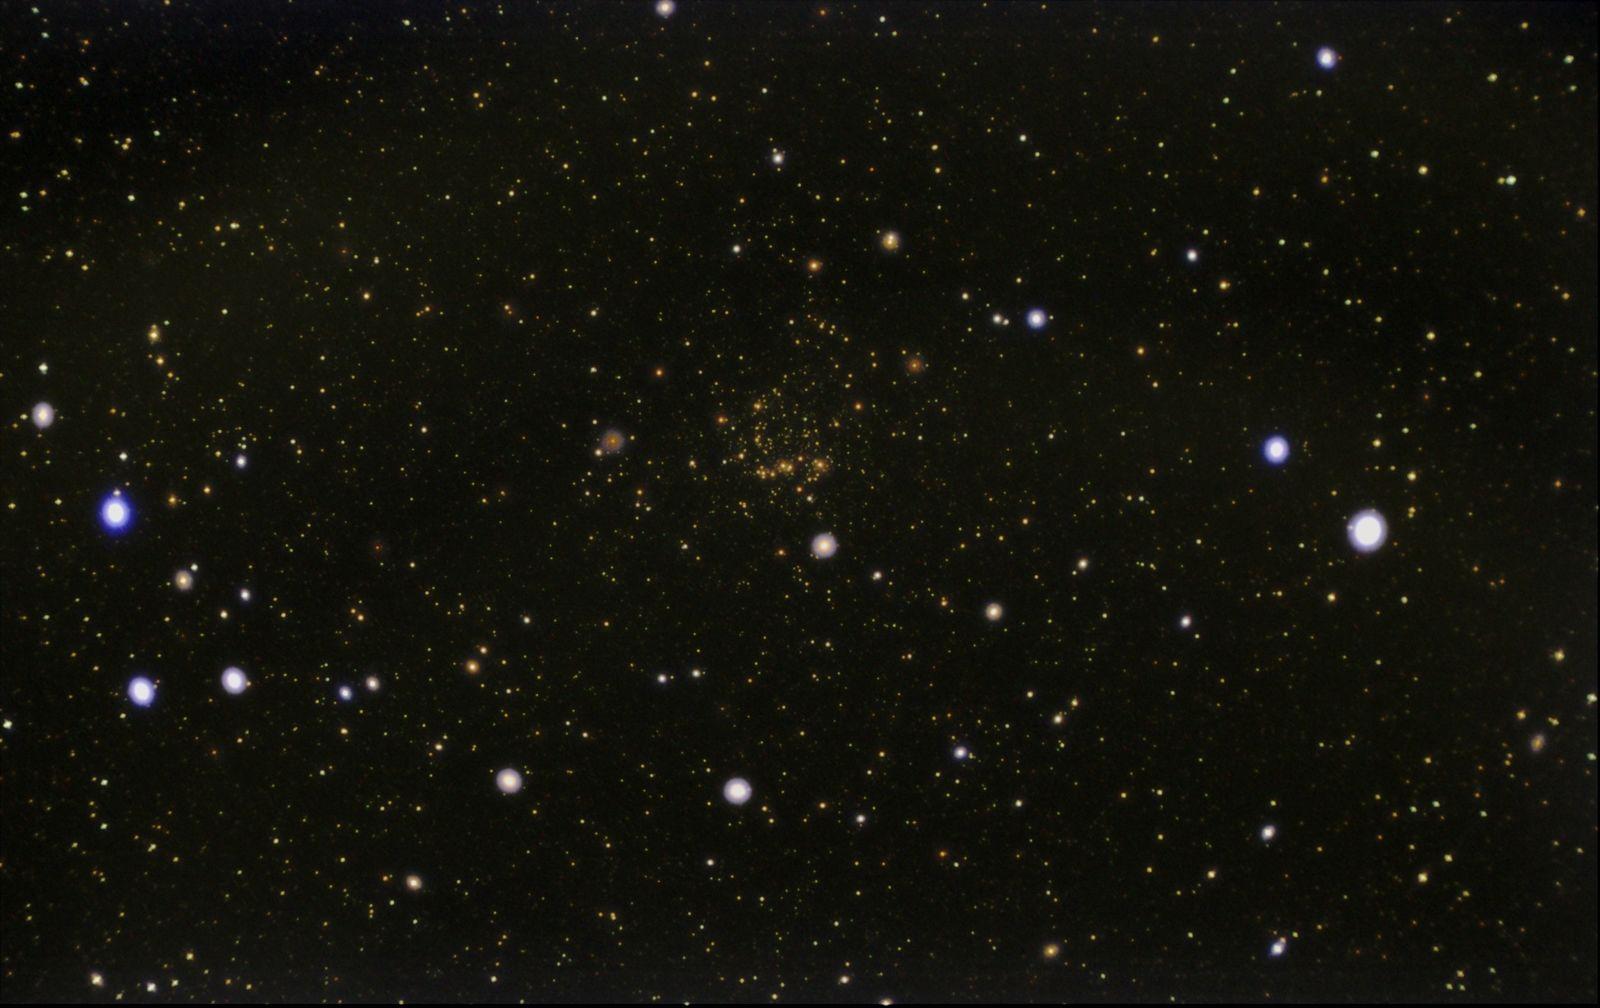 Ngc 7789 23x8s 340 gain Orion 50mm Guidescpe  GradientXterm, curves & levels in photoshop